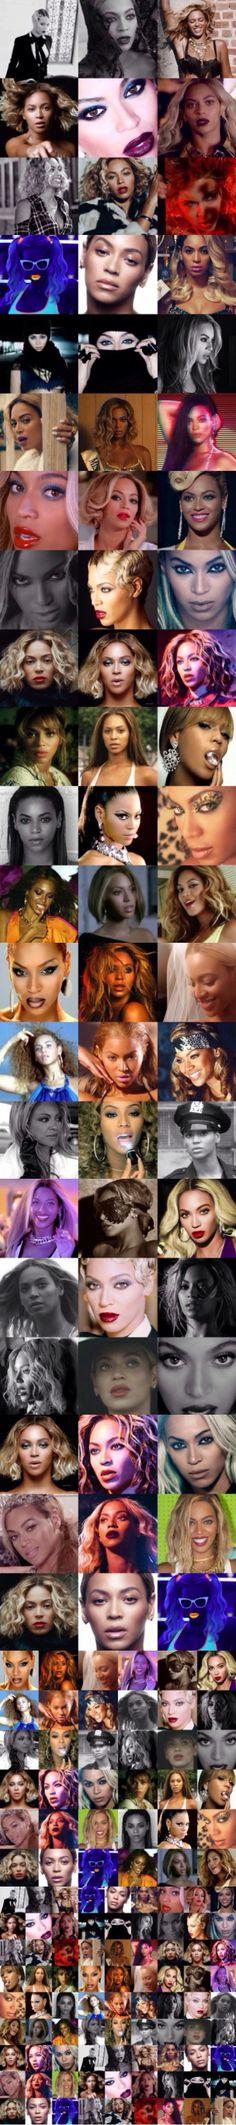 Beyonce Music Videos